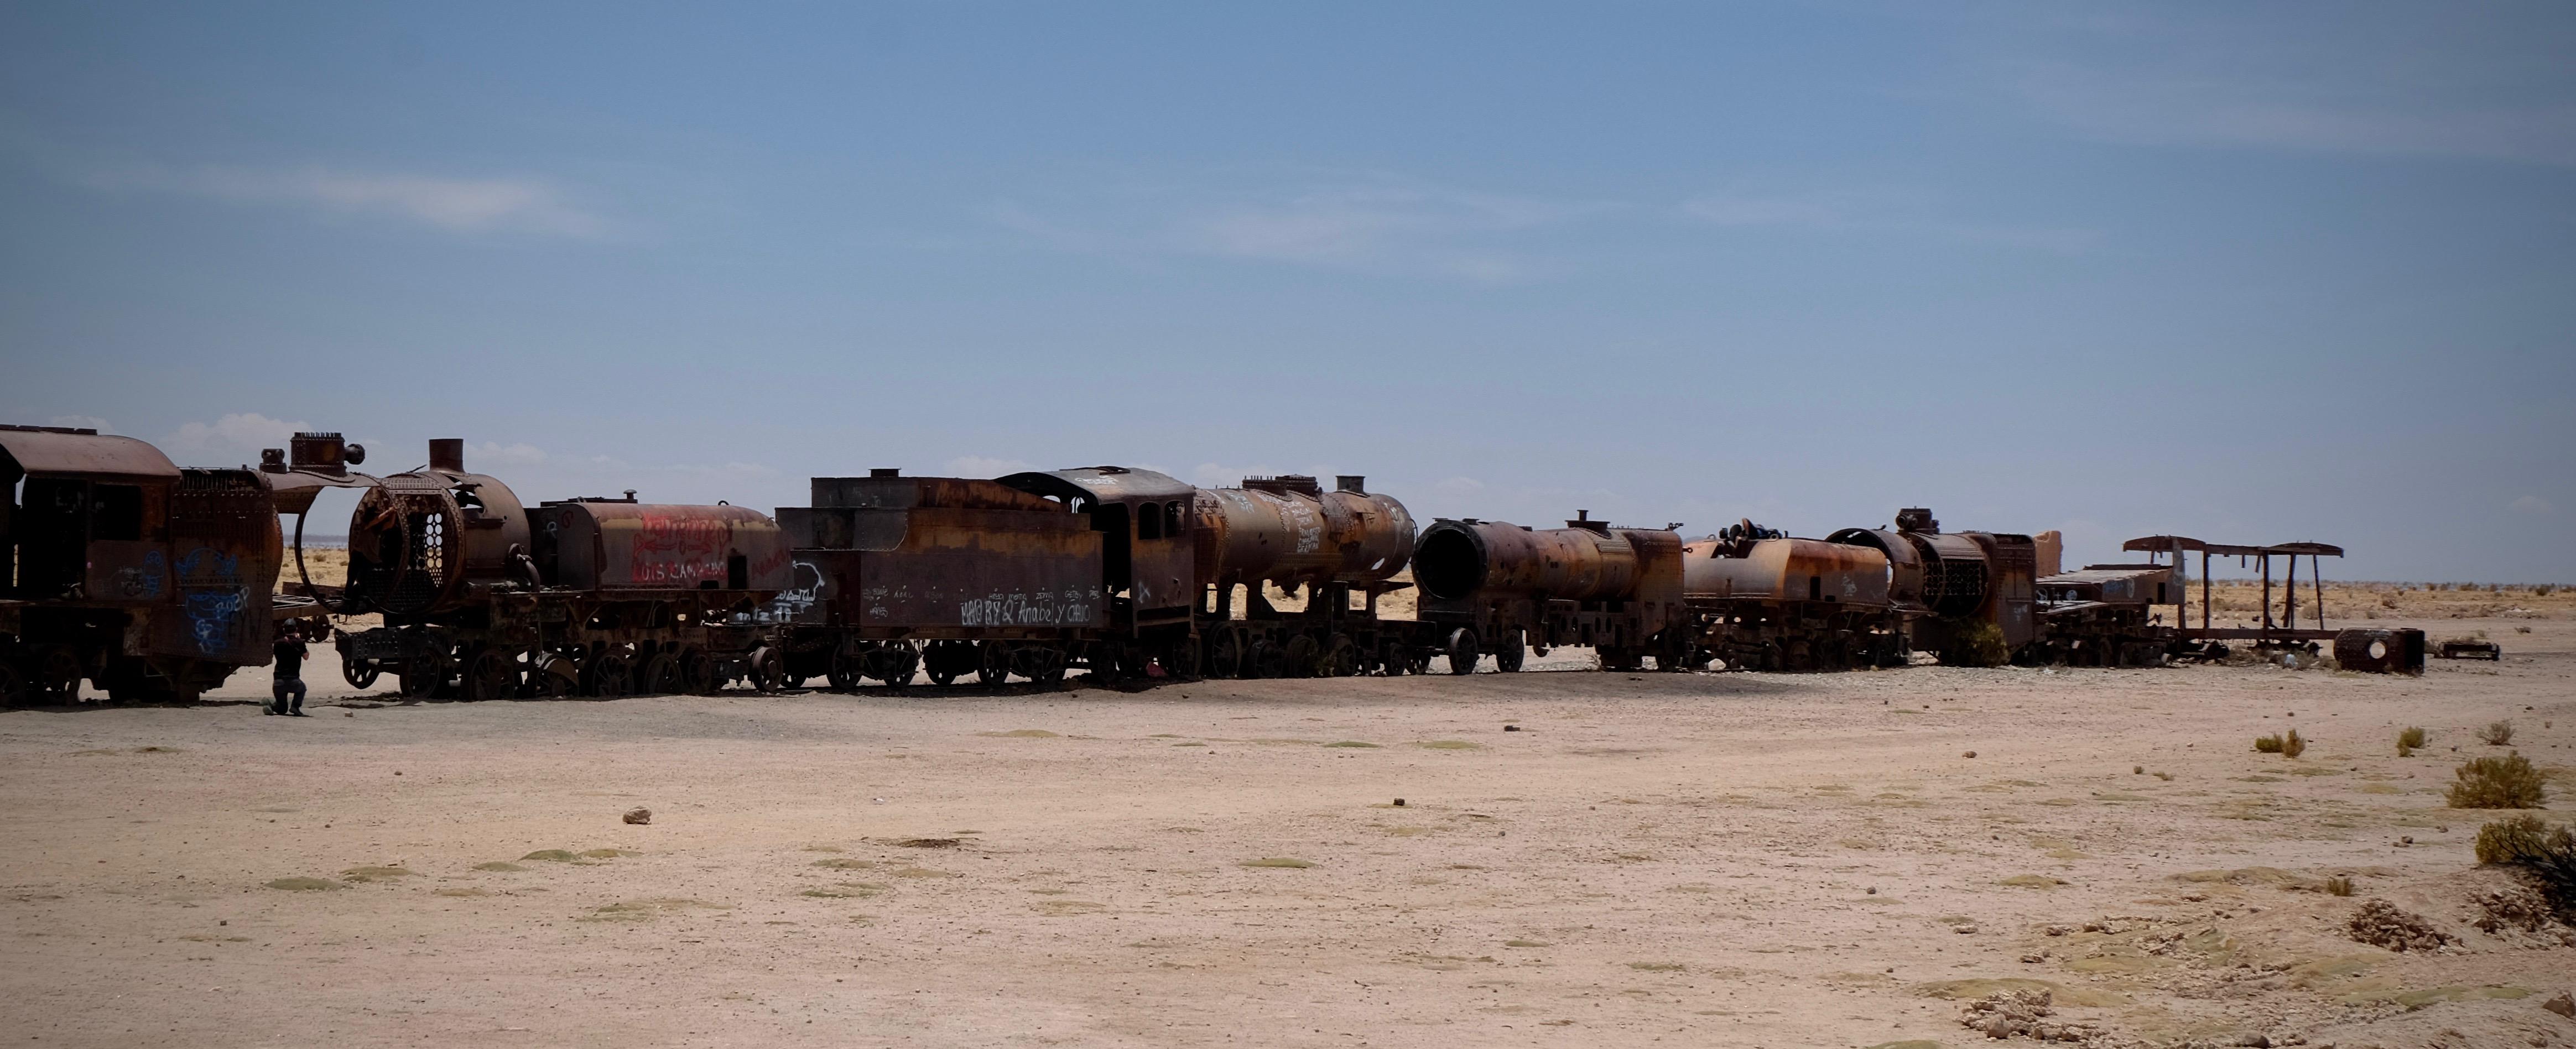 train cemetery Uyuni Bolivia